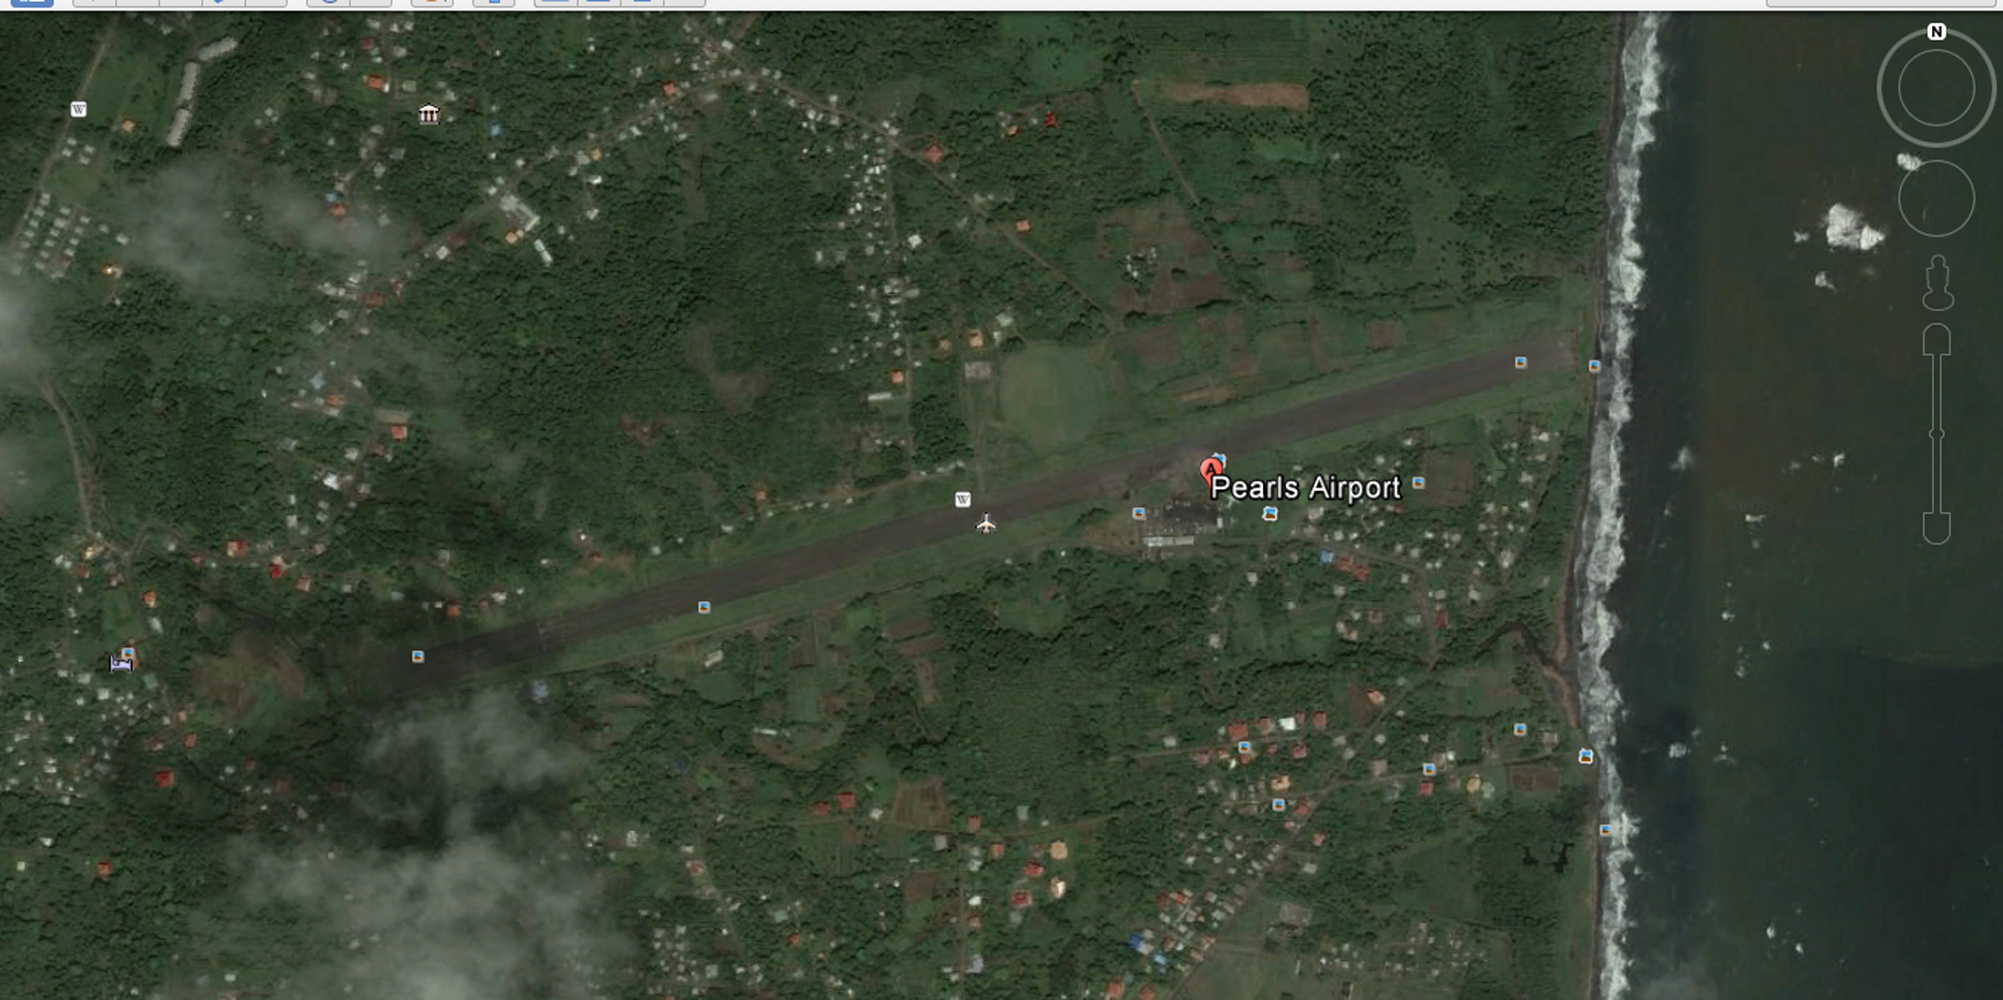 Pearls Airport, Granville, Grenada. Image: Google Earth